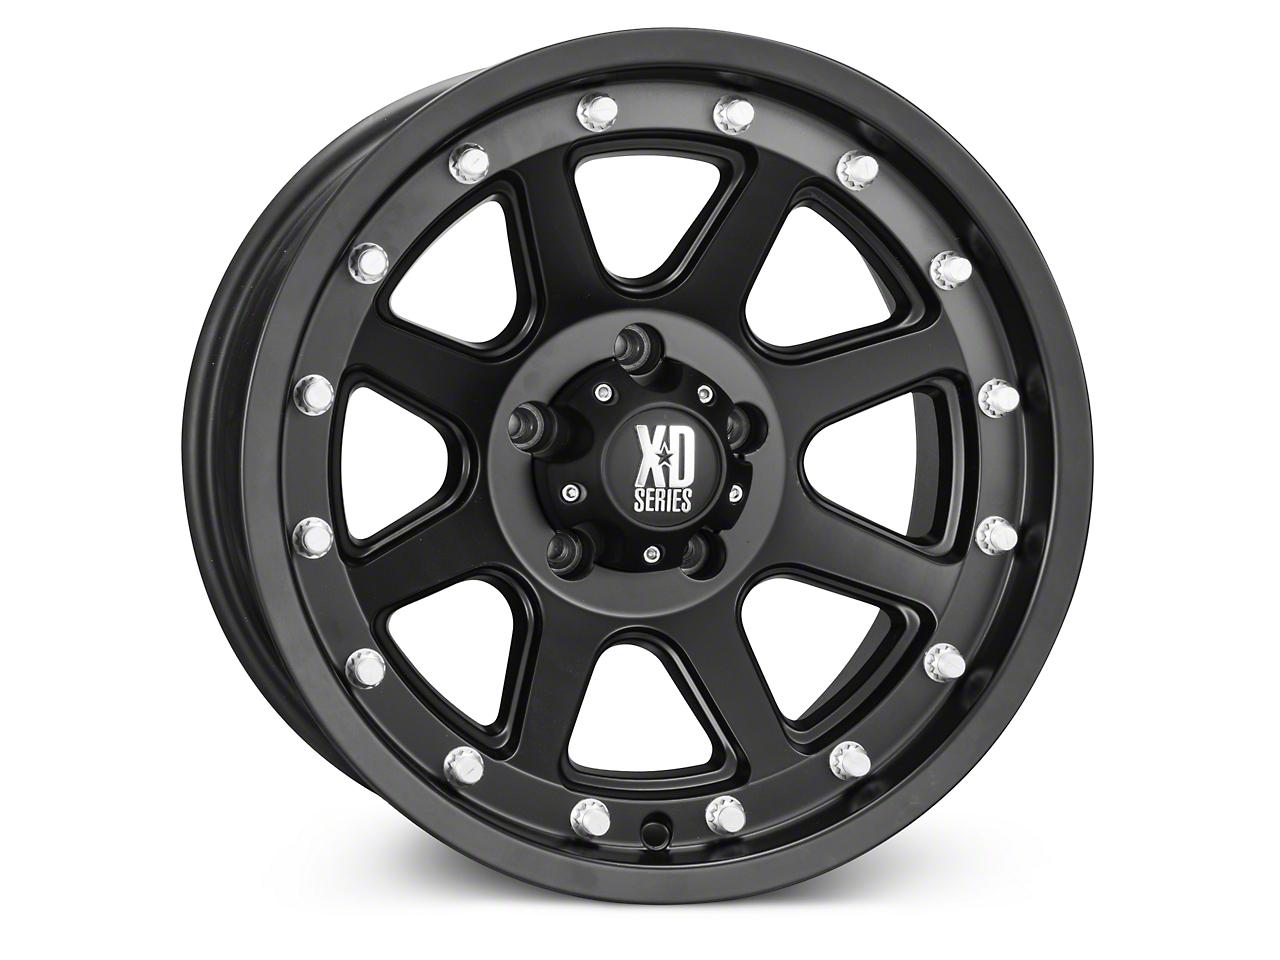 XD Addict Matte Black Wheel - 17x9 (07-18 Jeep Wrangler JK; 2018 Jeep Wrangler JL)